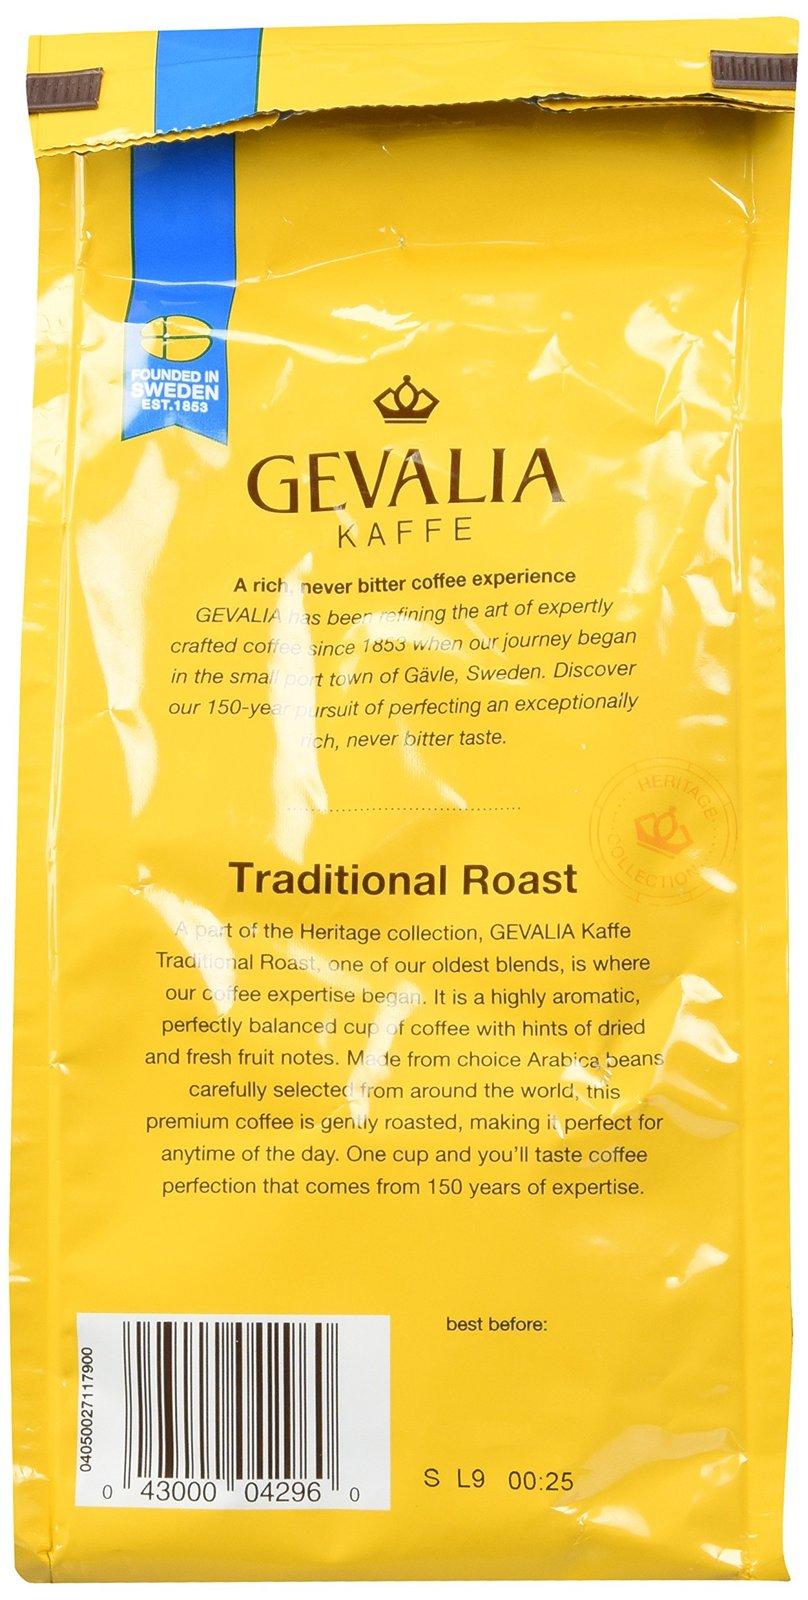 Gevalia, Kaffe, Traditional Roast, Ground Coffee, 12oz Bag (Pack of 2)